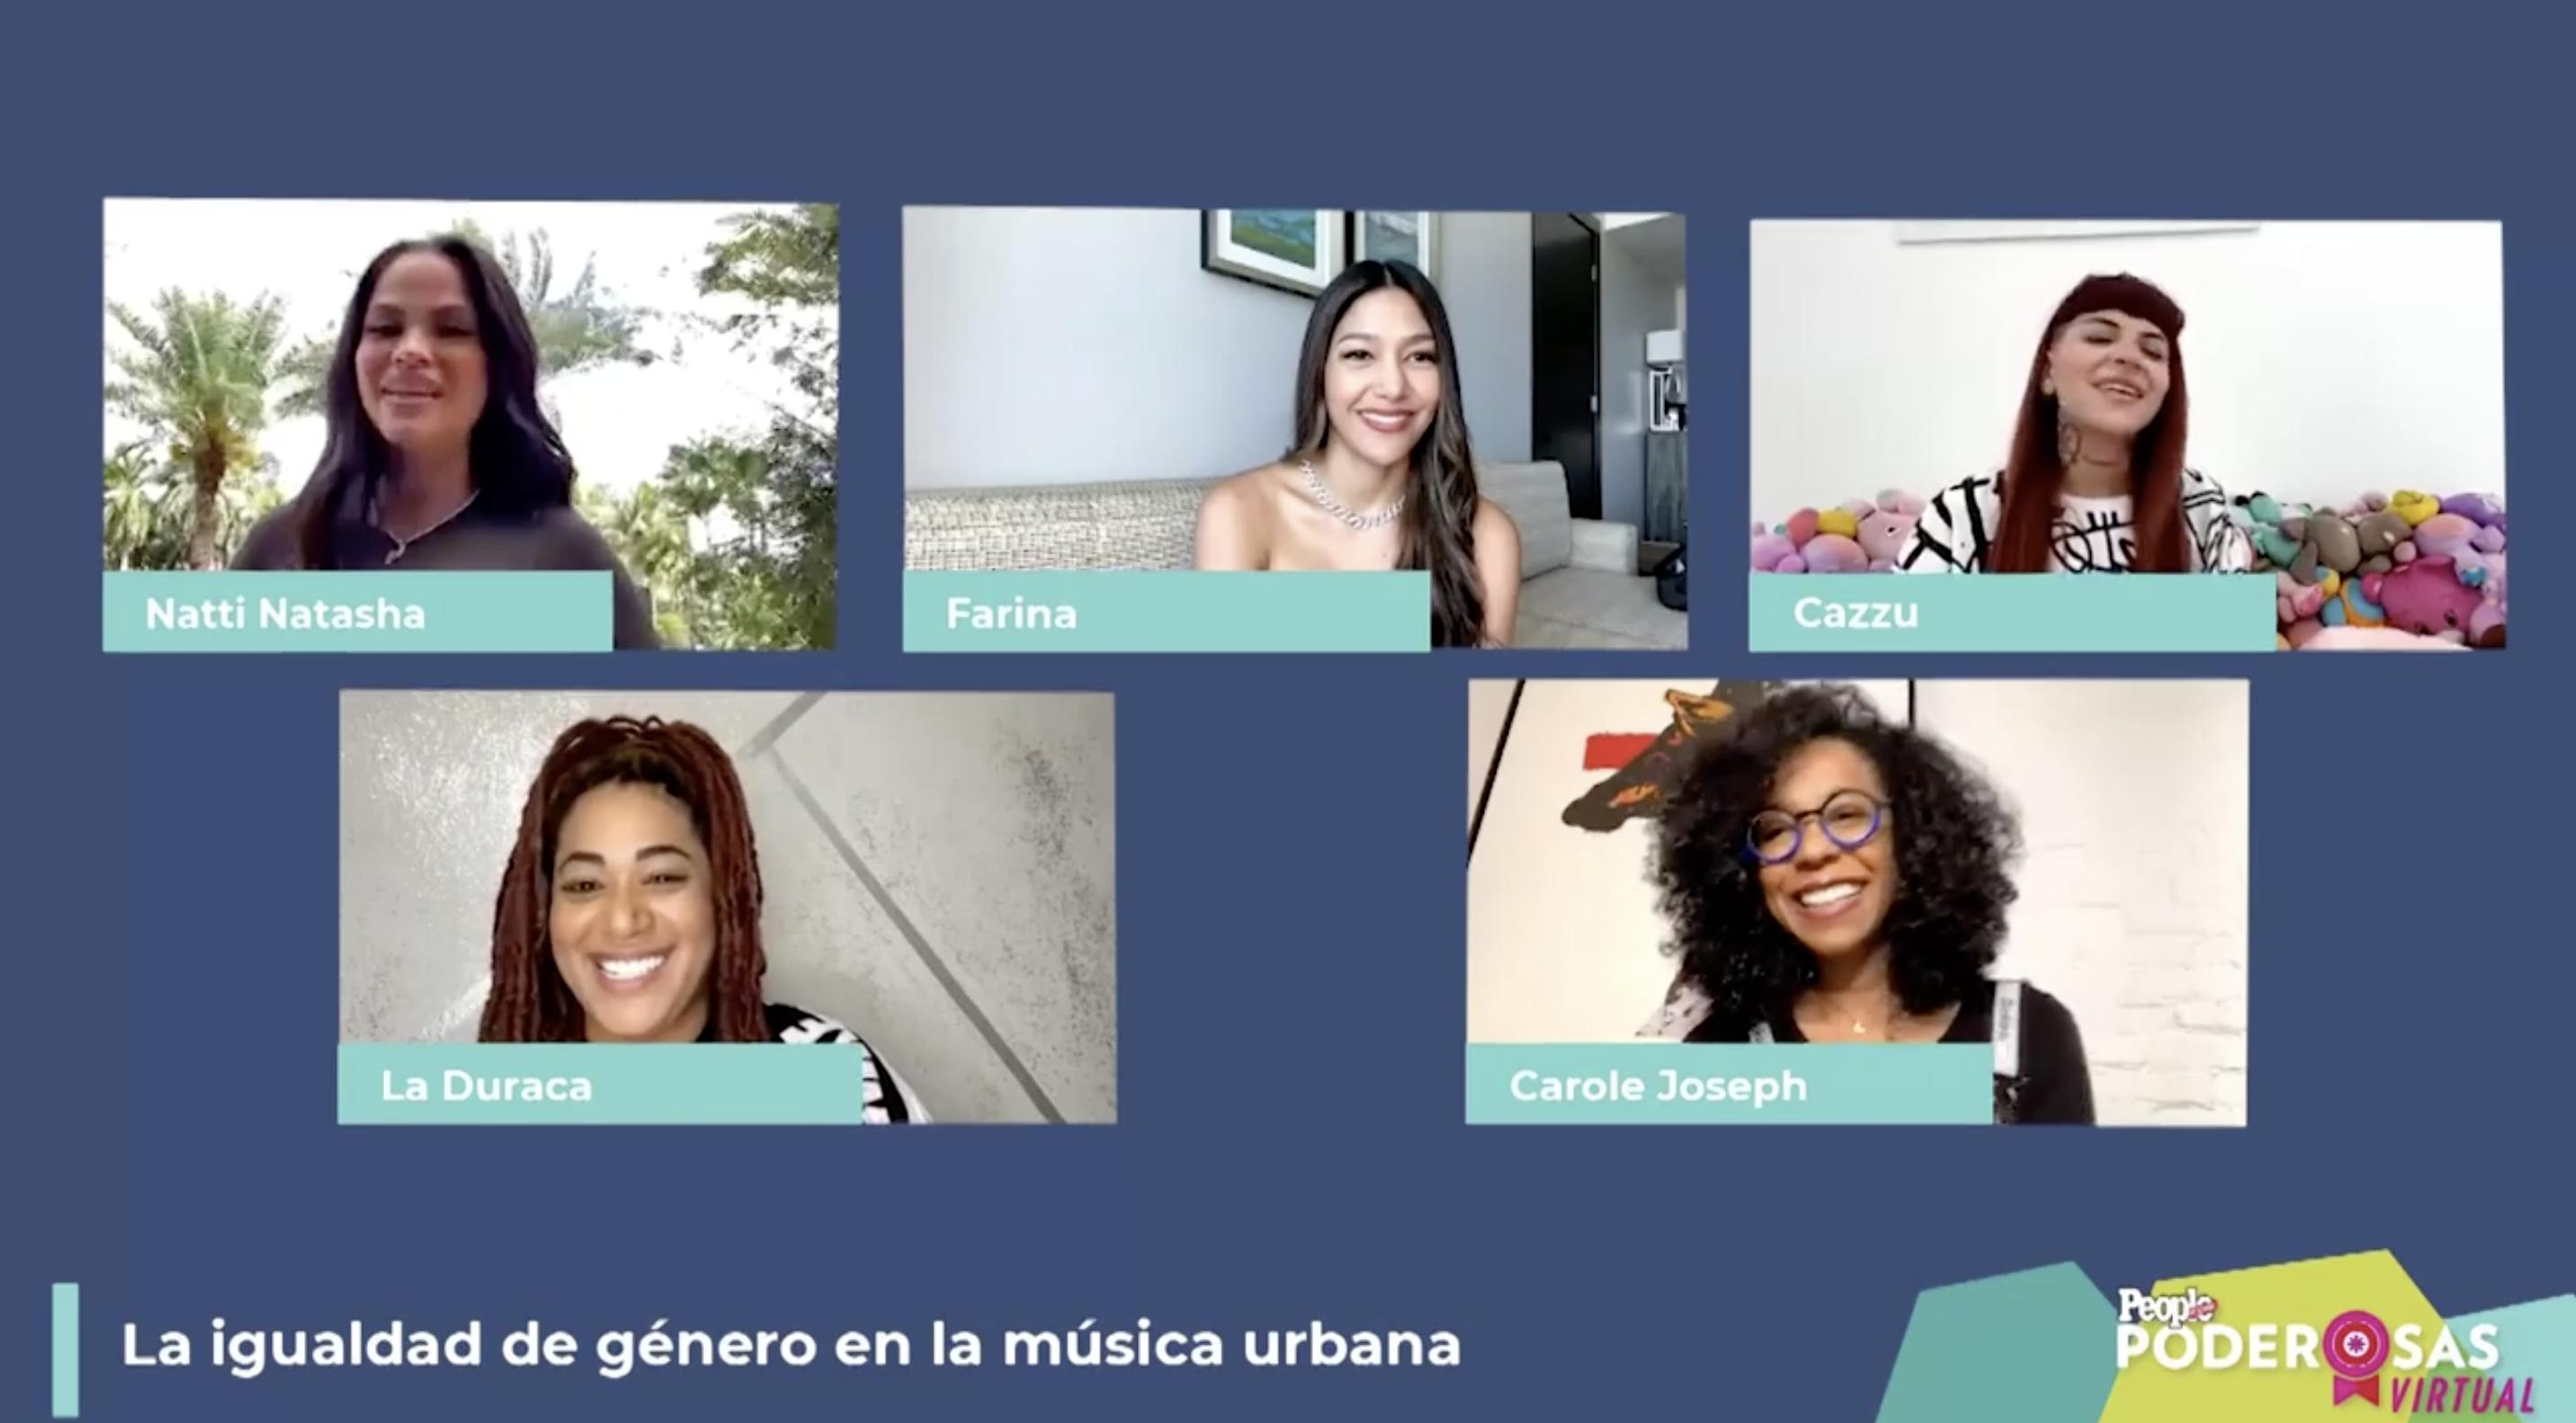 Natti Natasha, Farina, La Duraca y Cazzu